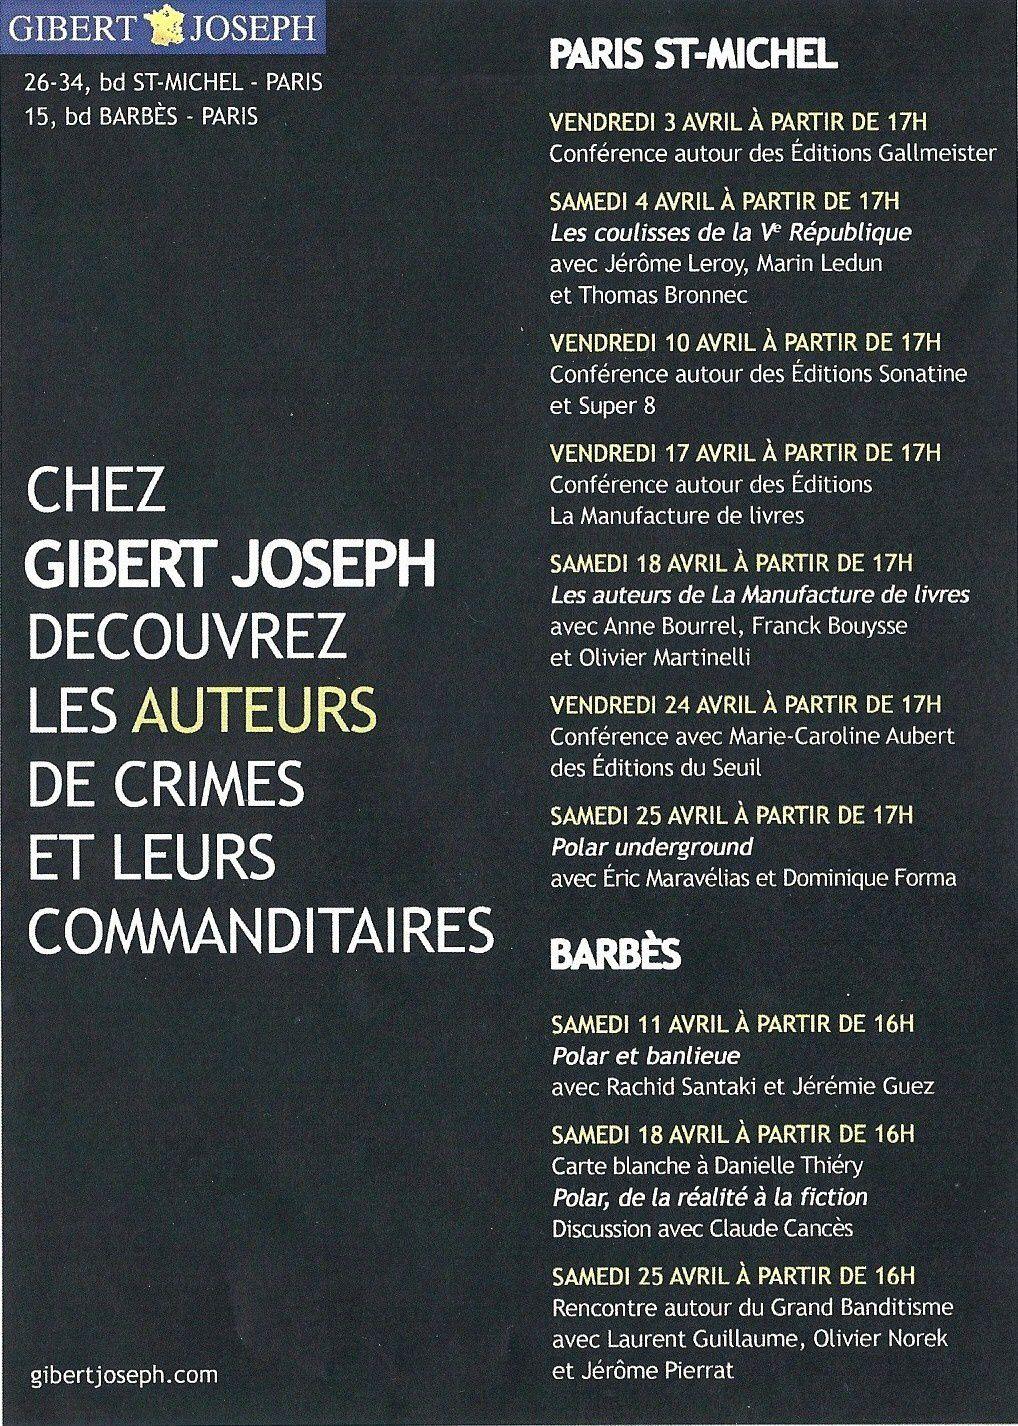 Rencontres d'avril chez J. Gibert